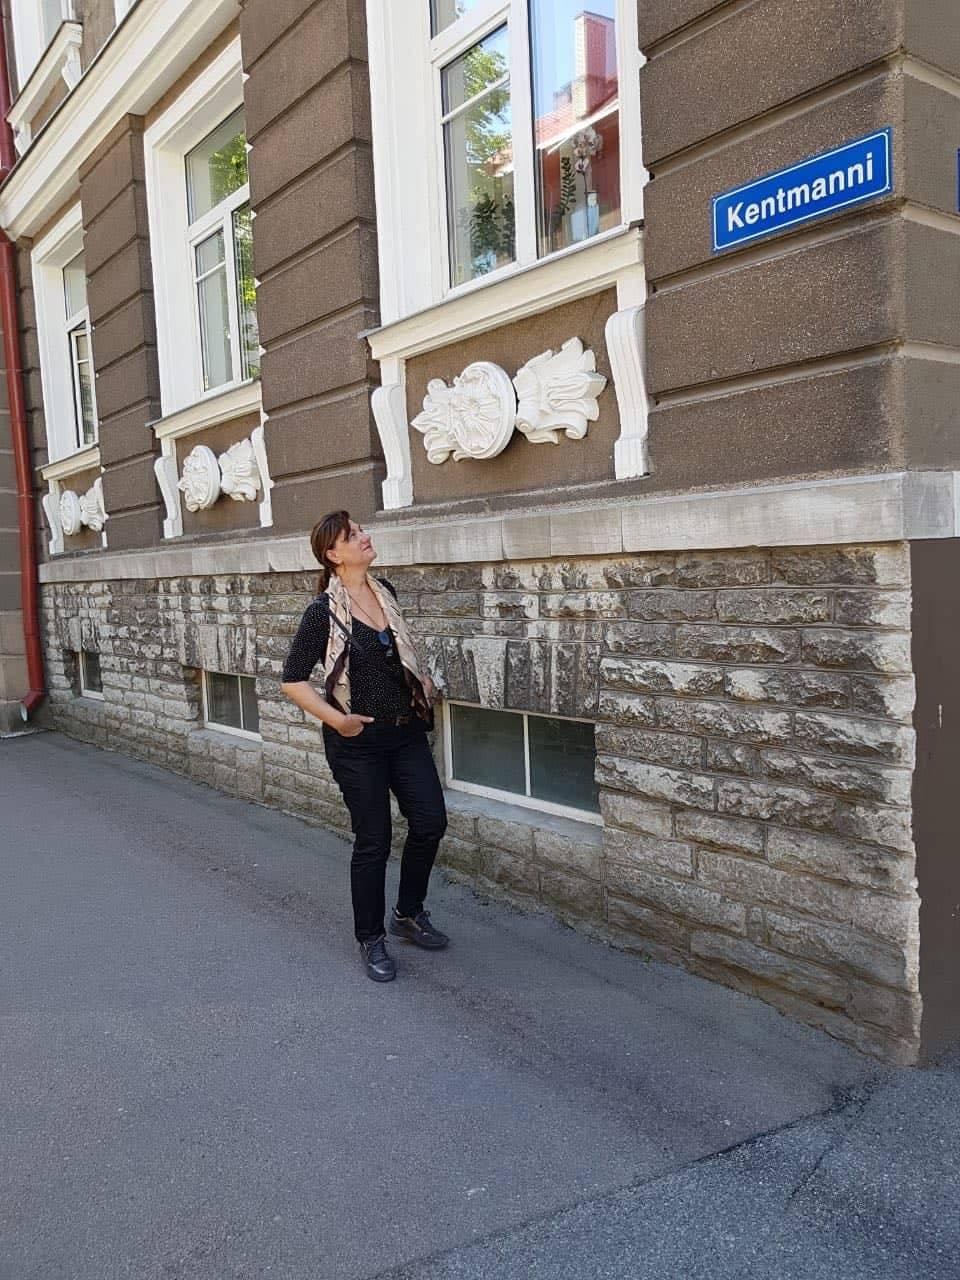 Kentmanni-Kentmann-Strasse-Tallin, Estland auf dem Domberg